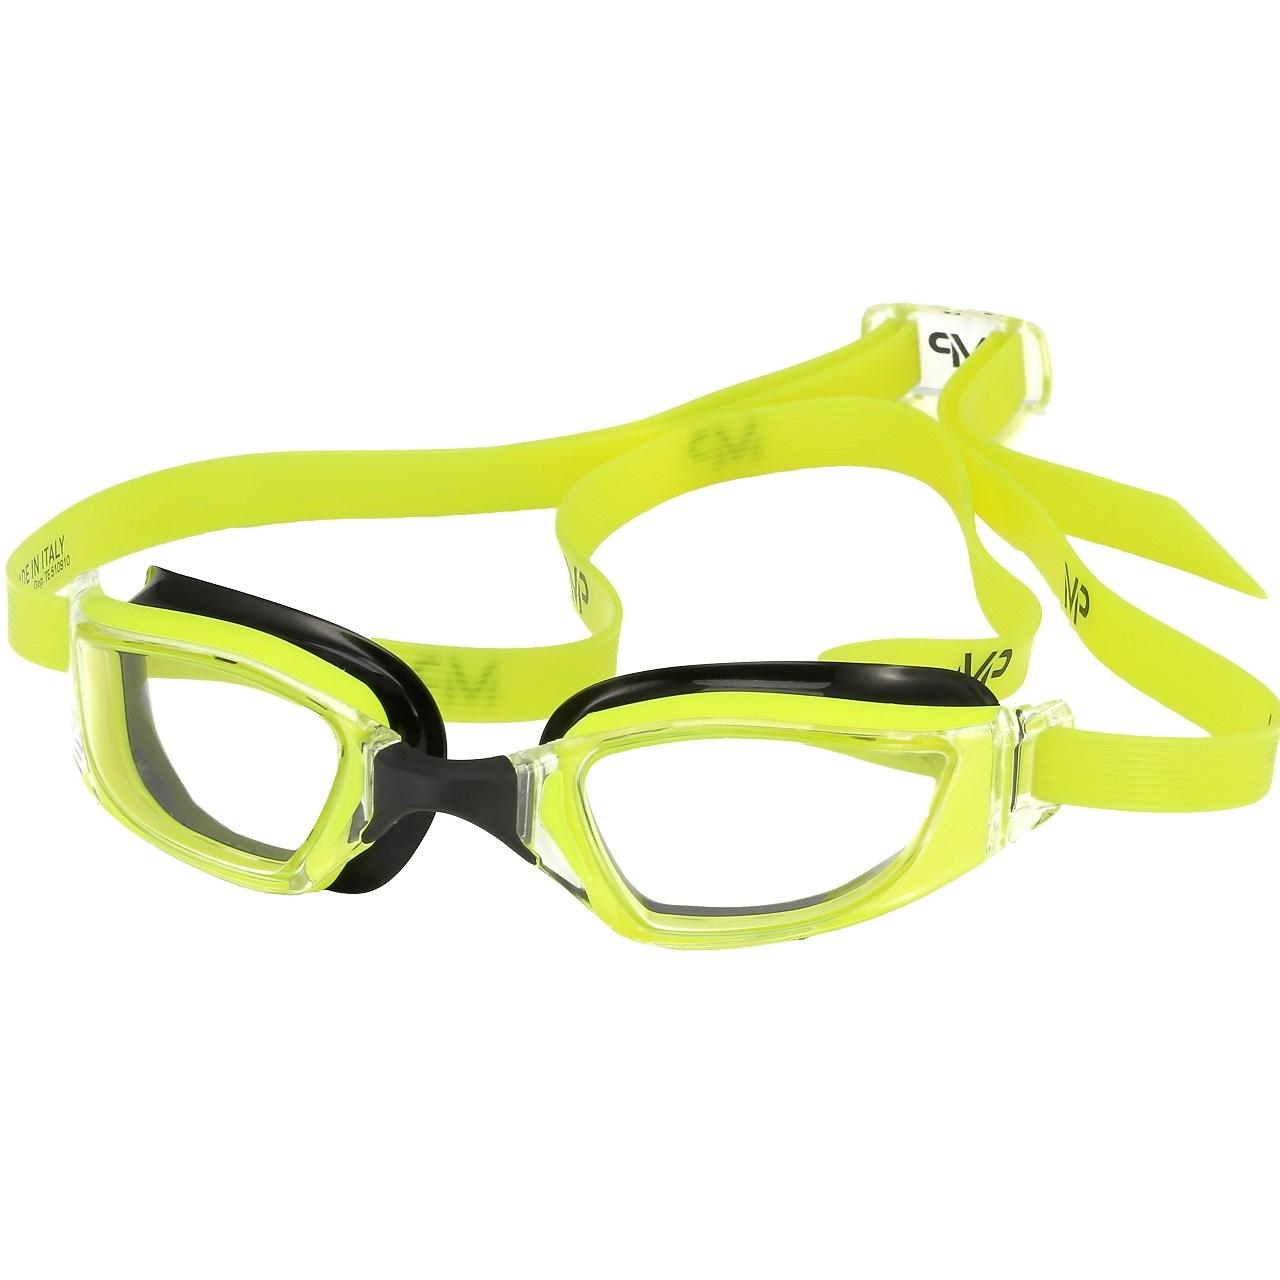 عینک شنای ام پی مدل Xceed لنز شفاف